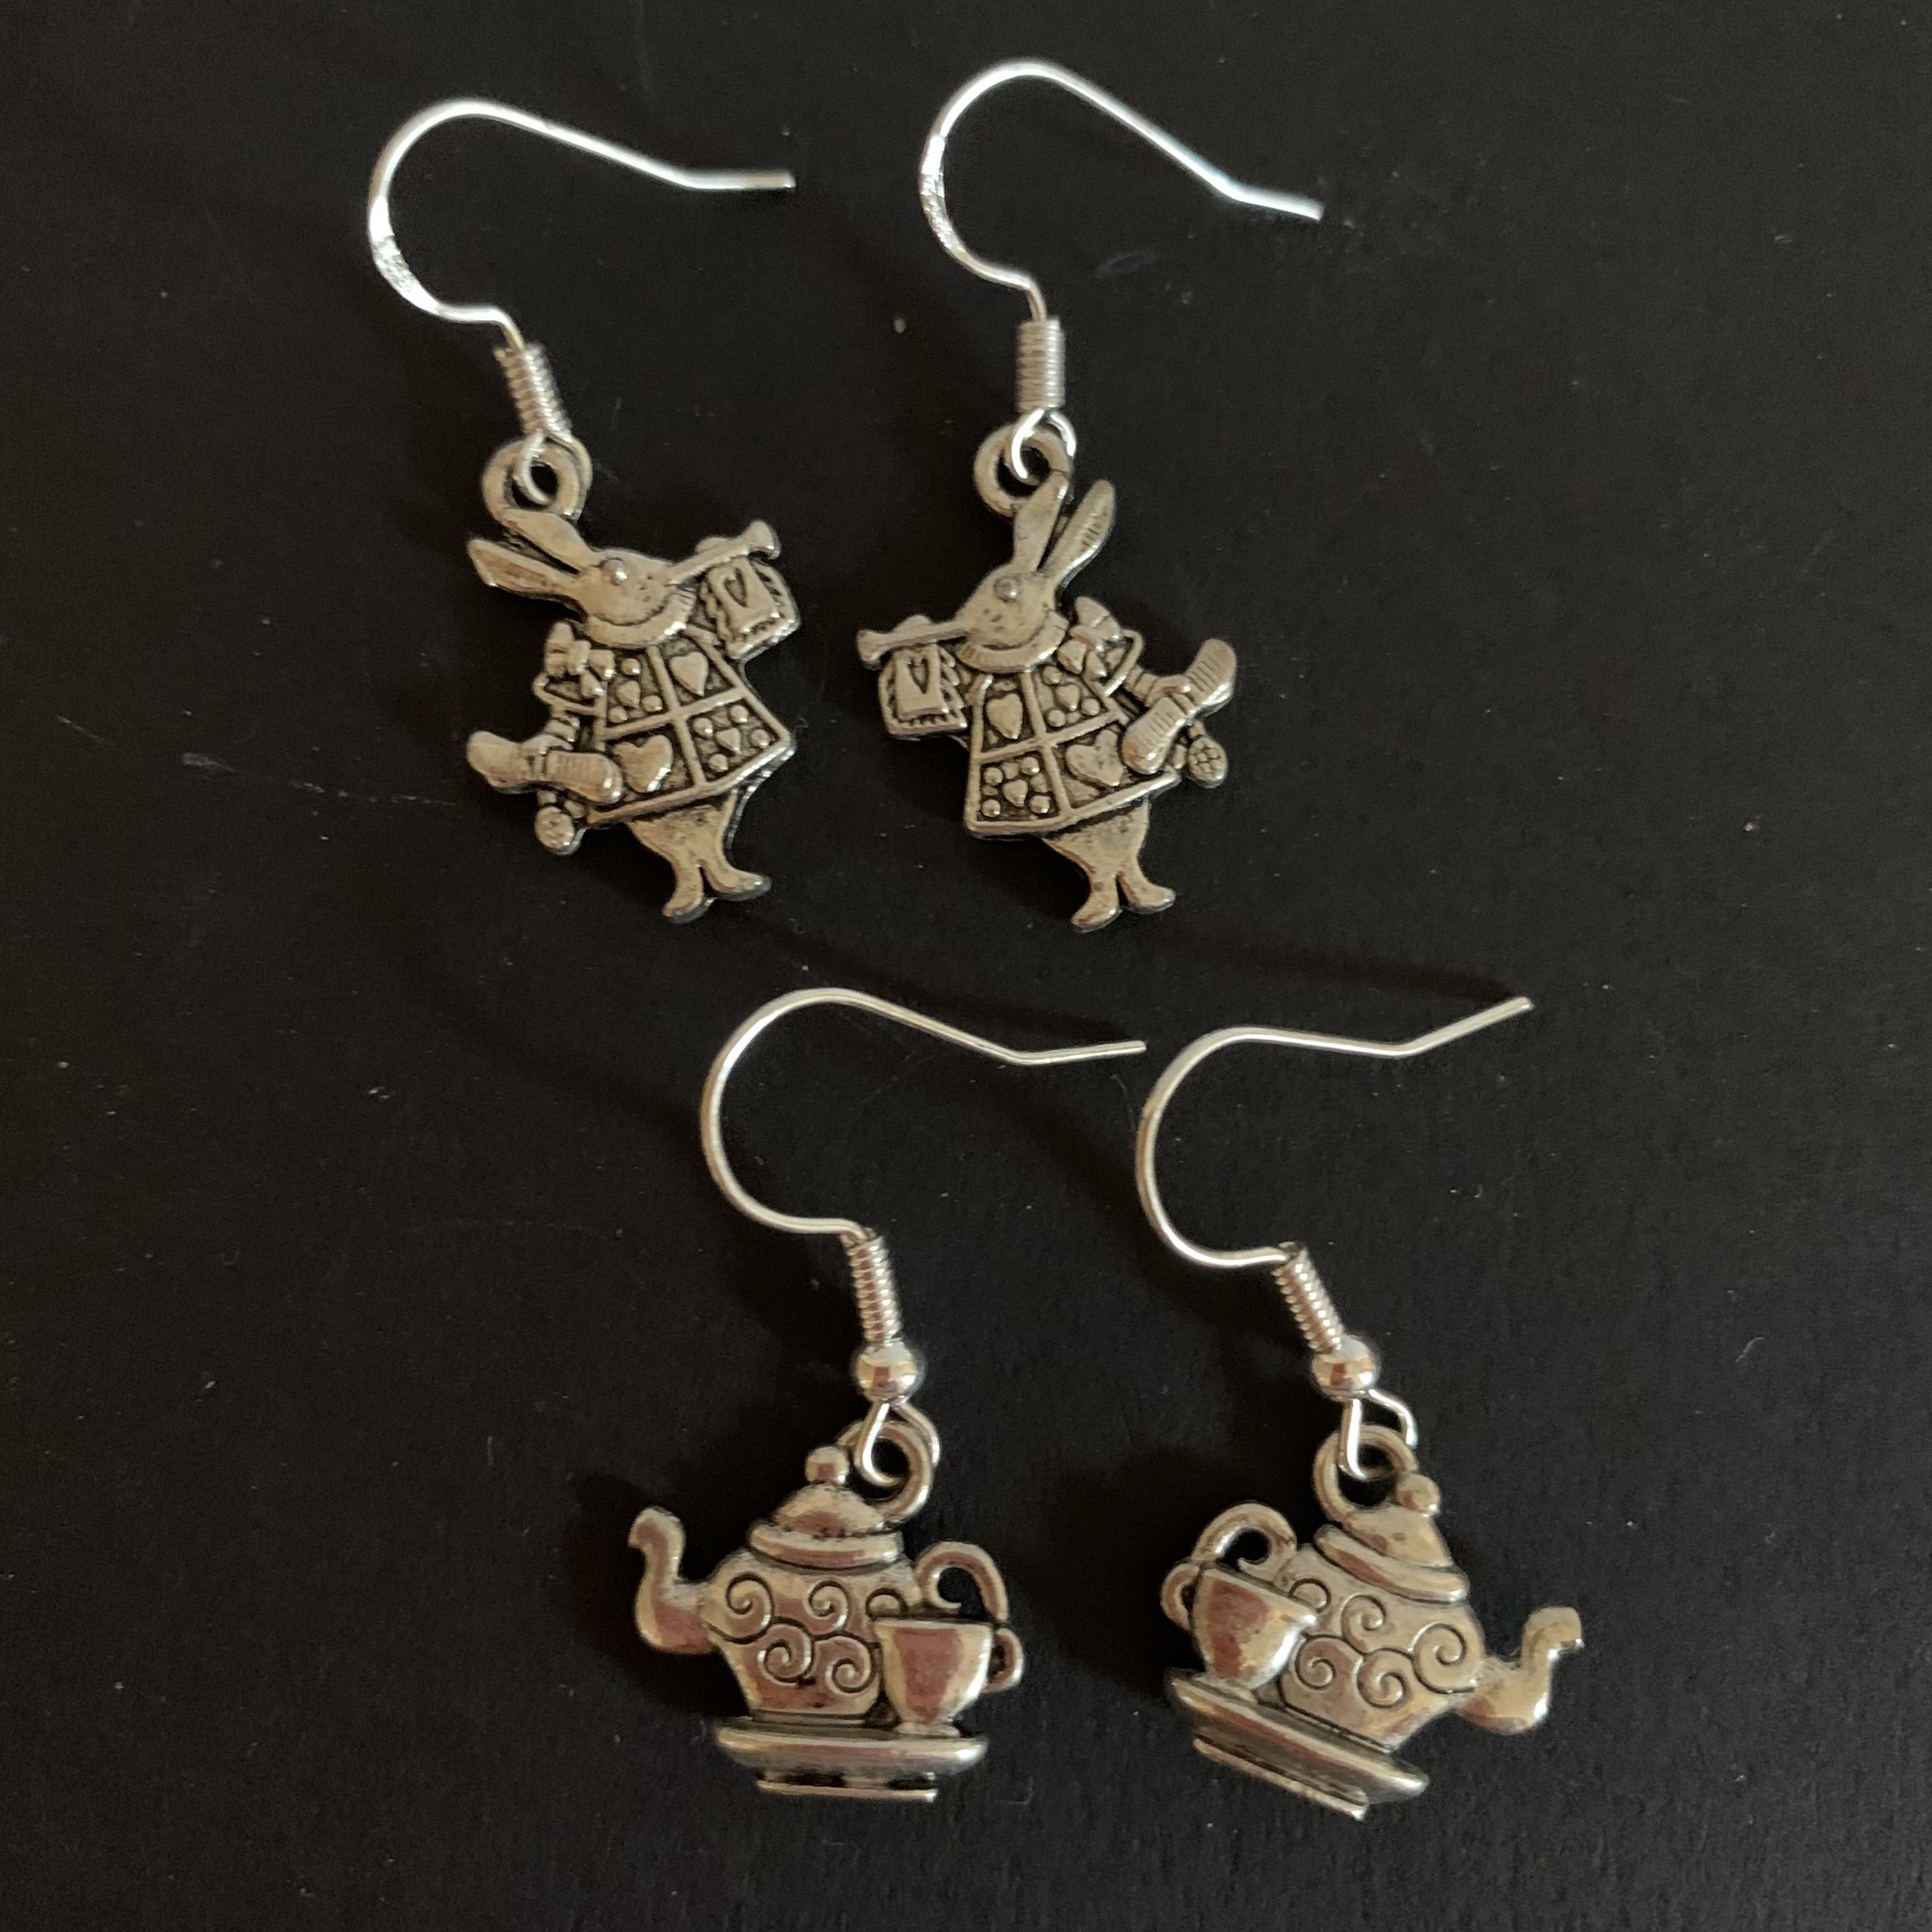 Jewellery White Rabbit and Teapot Earrings £3 each